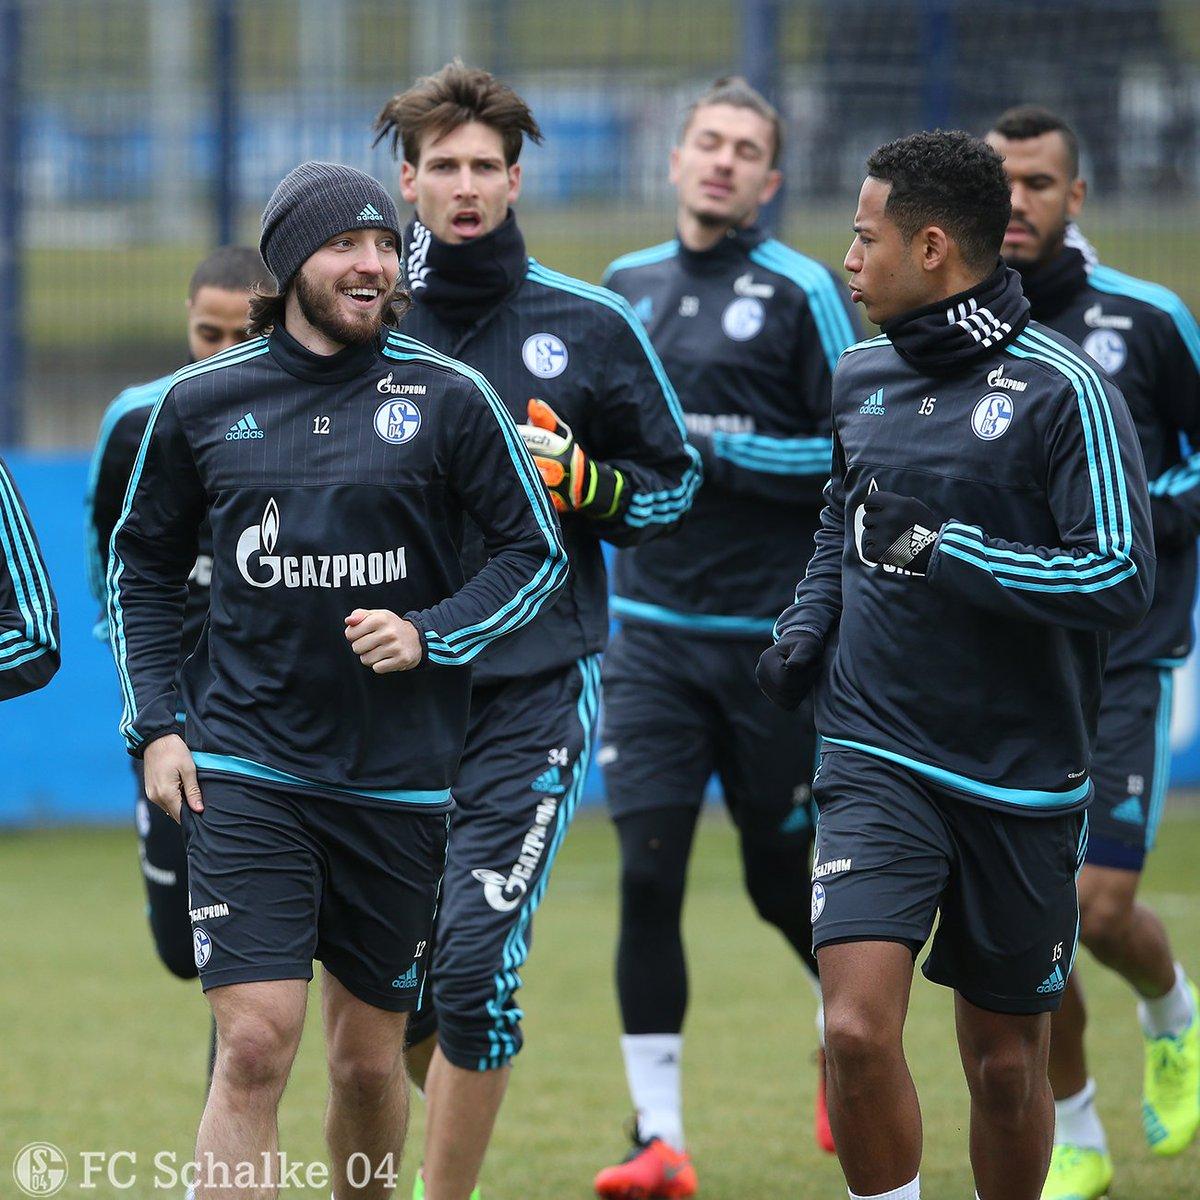 Wie Hat Schalke Heute Gespielt